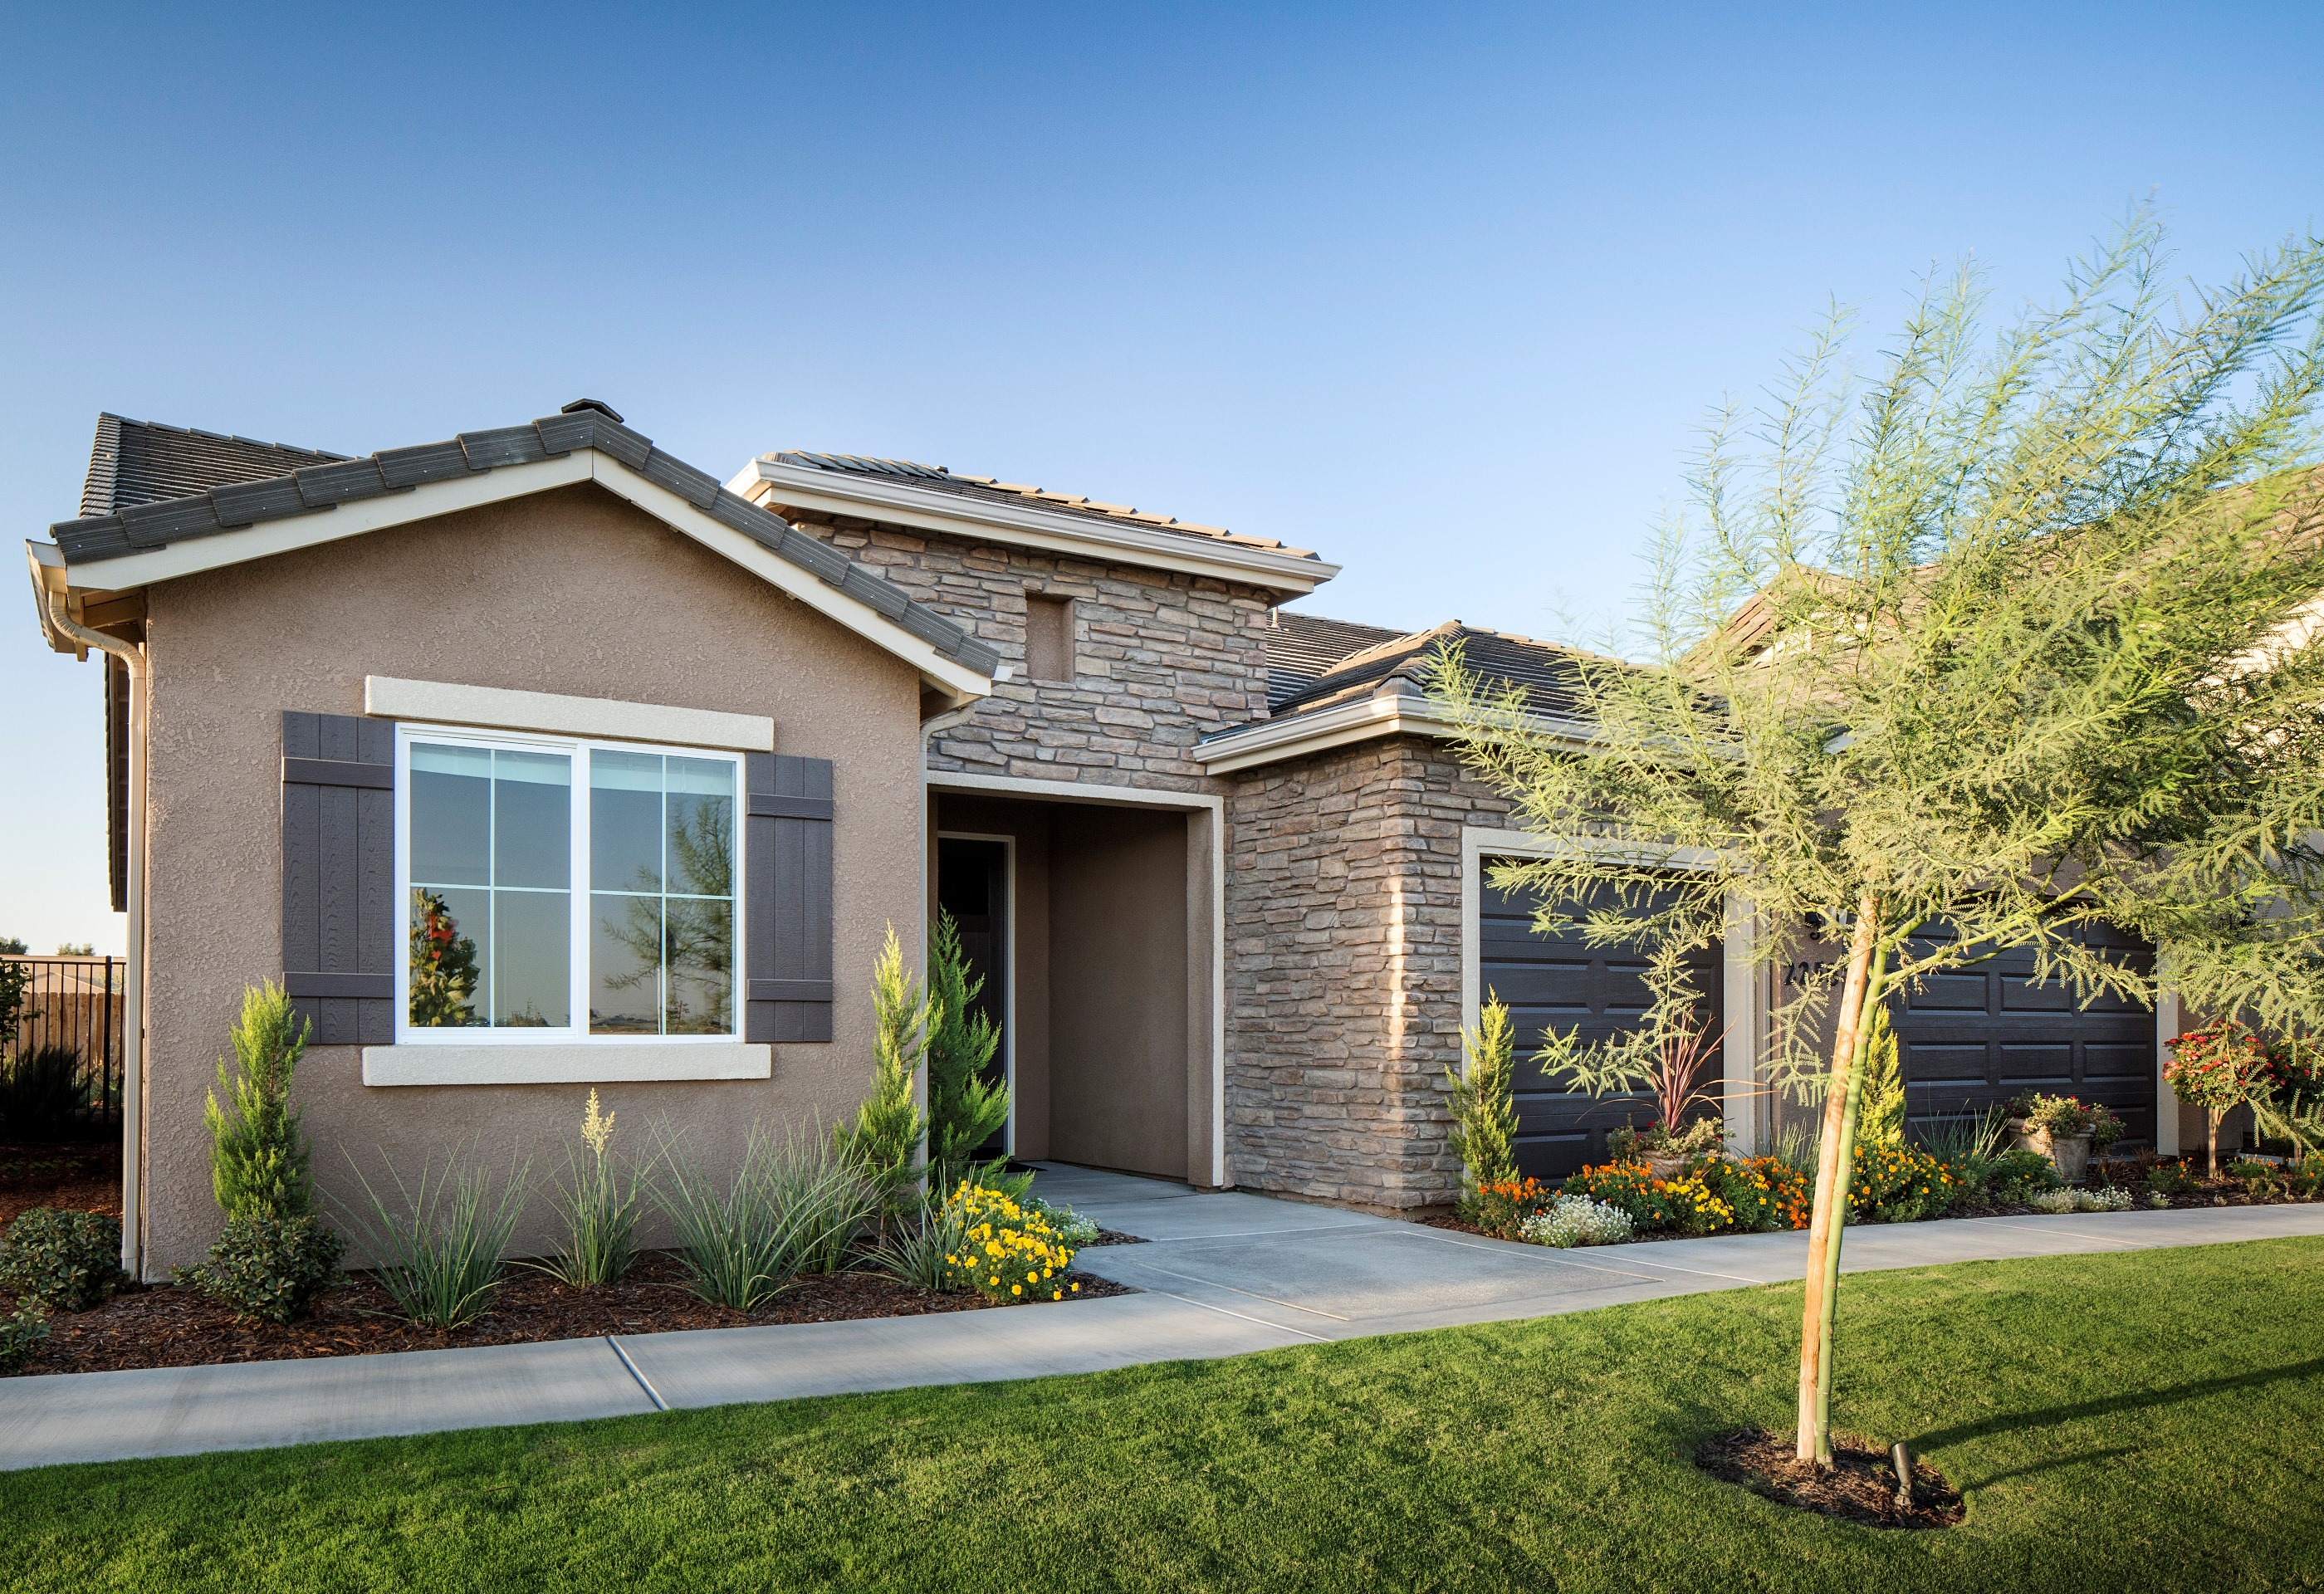 Sjv homes plans 142 home community builder magazine for Builder magazine house plans